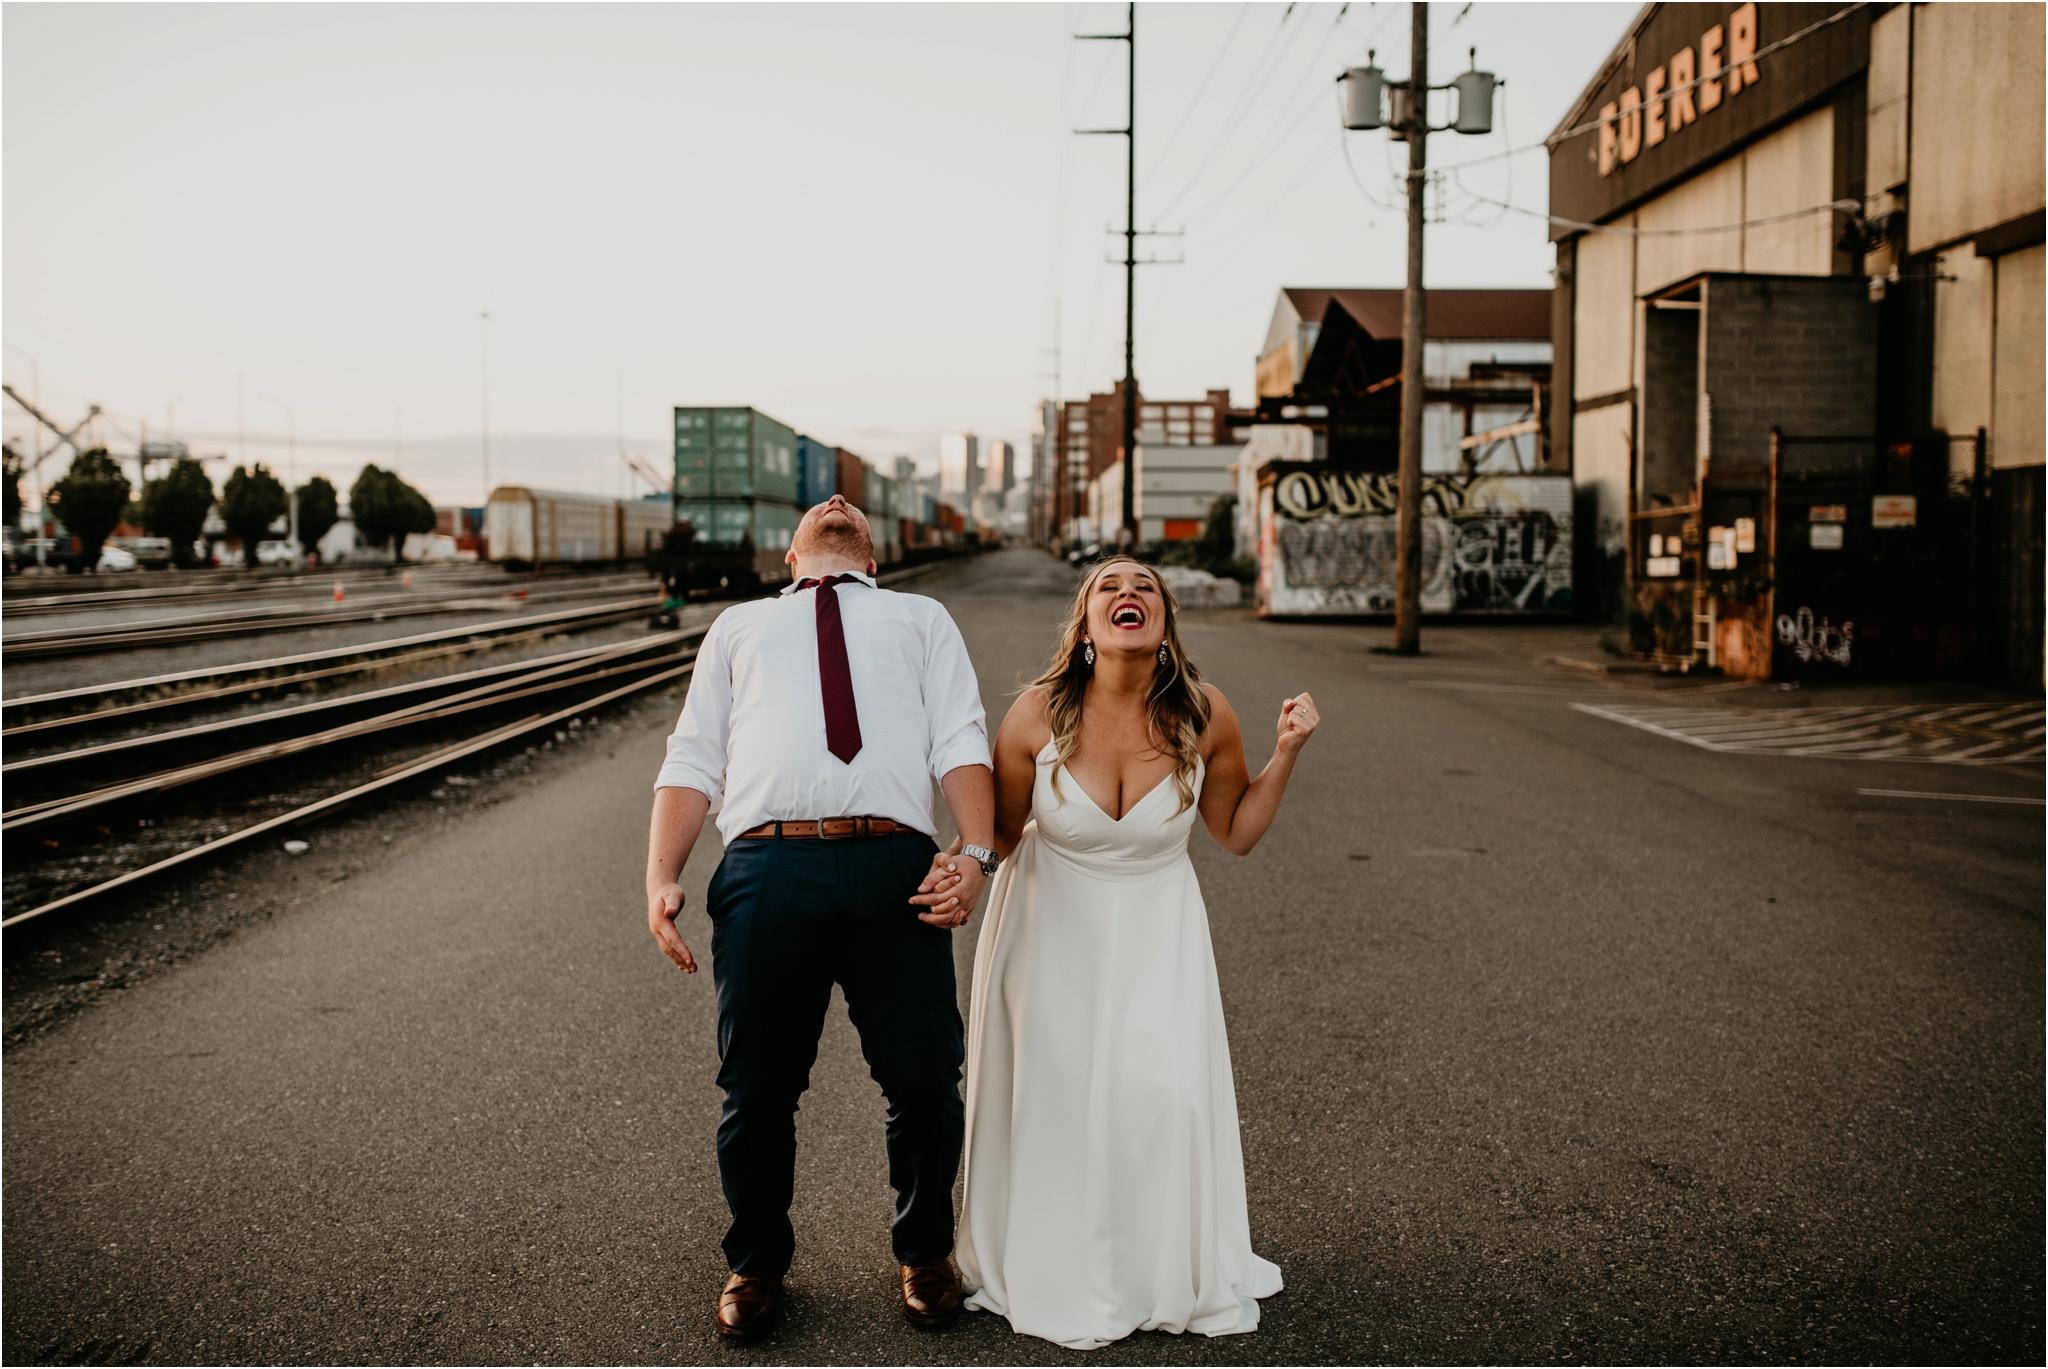 laura-and-matt-metropolist-urban-seattle-wedding-photographer-144.jpg